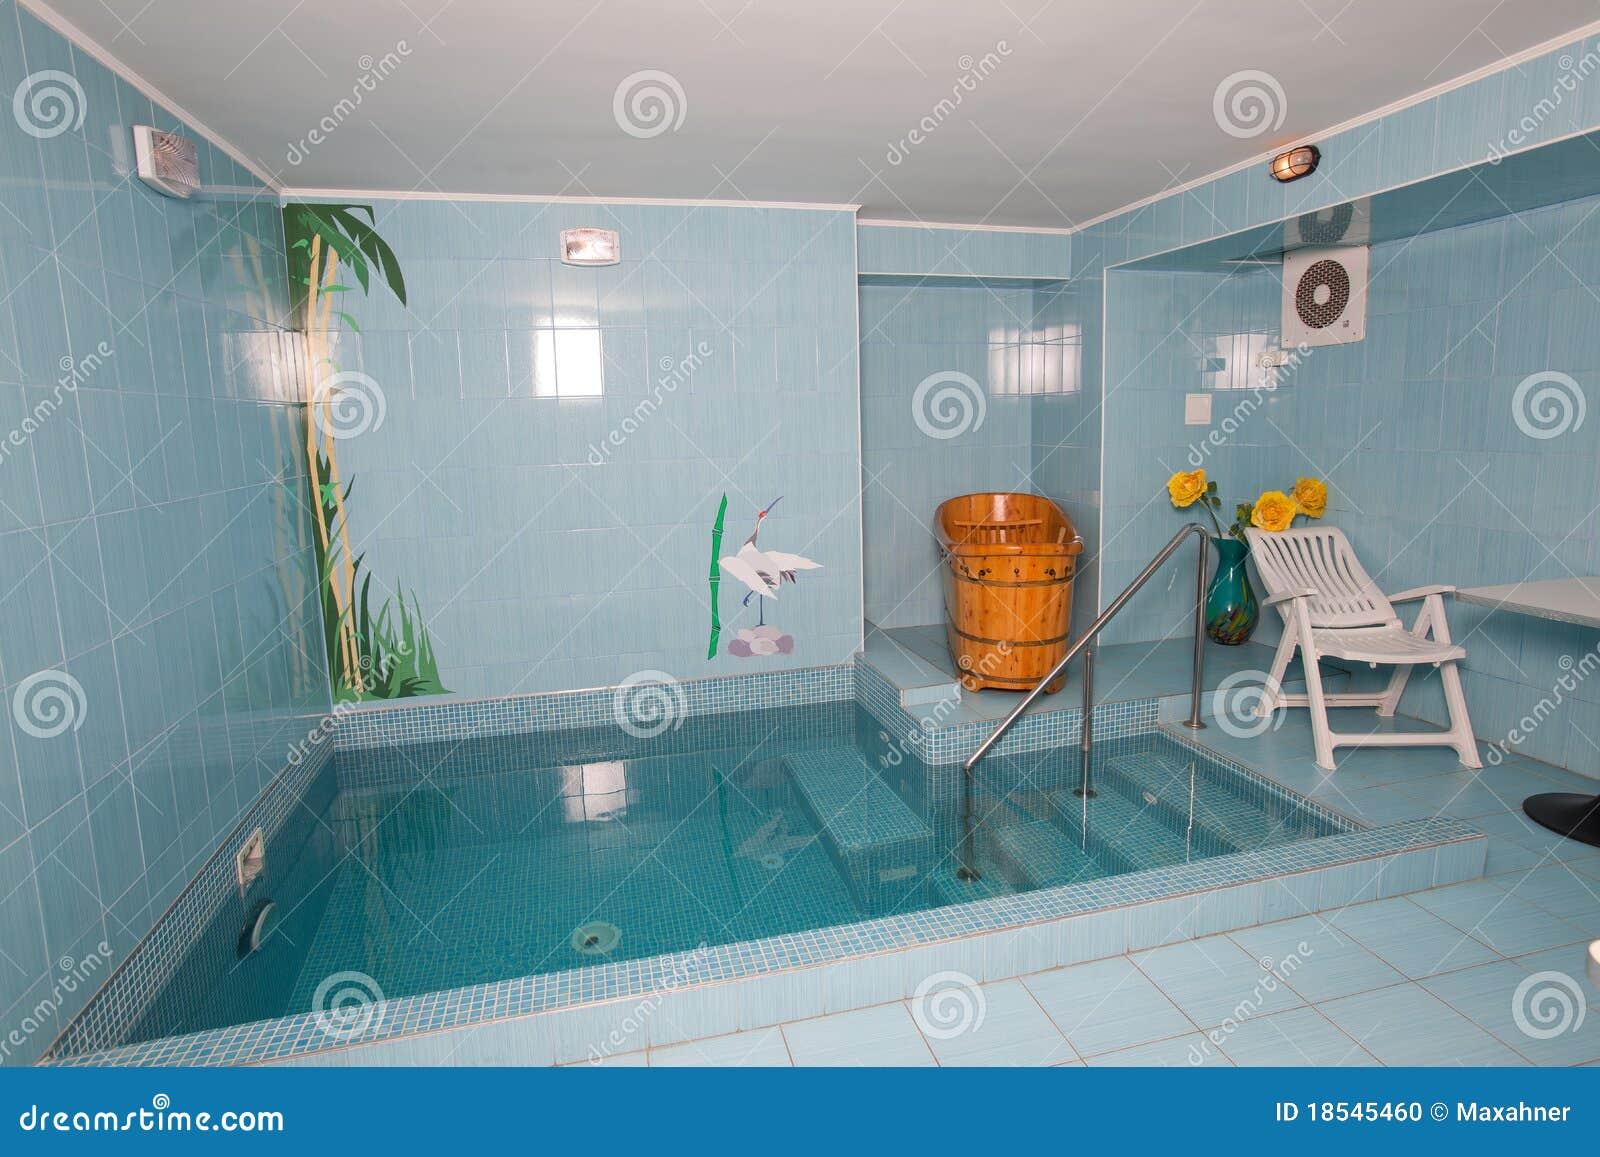 Salle de bains avec la petite piscine photo stock image for Piscine xs prix